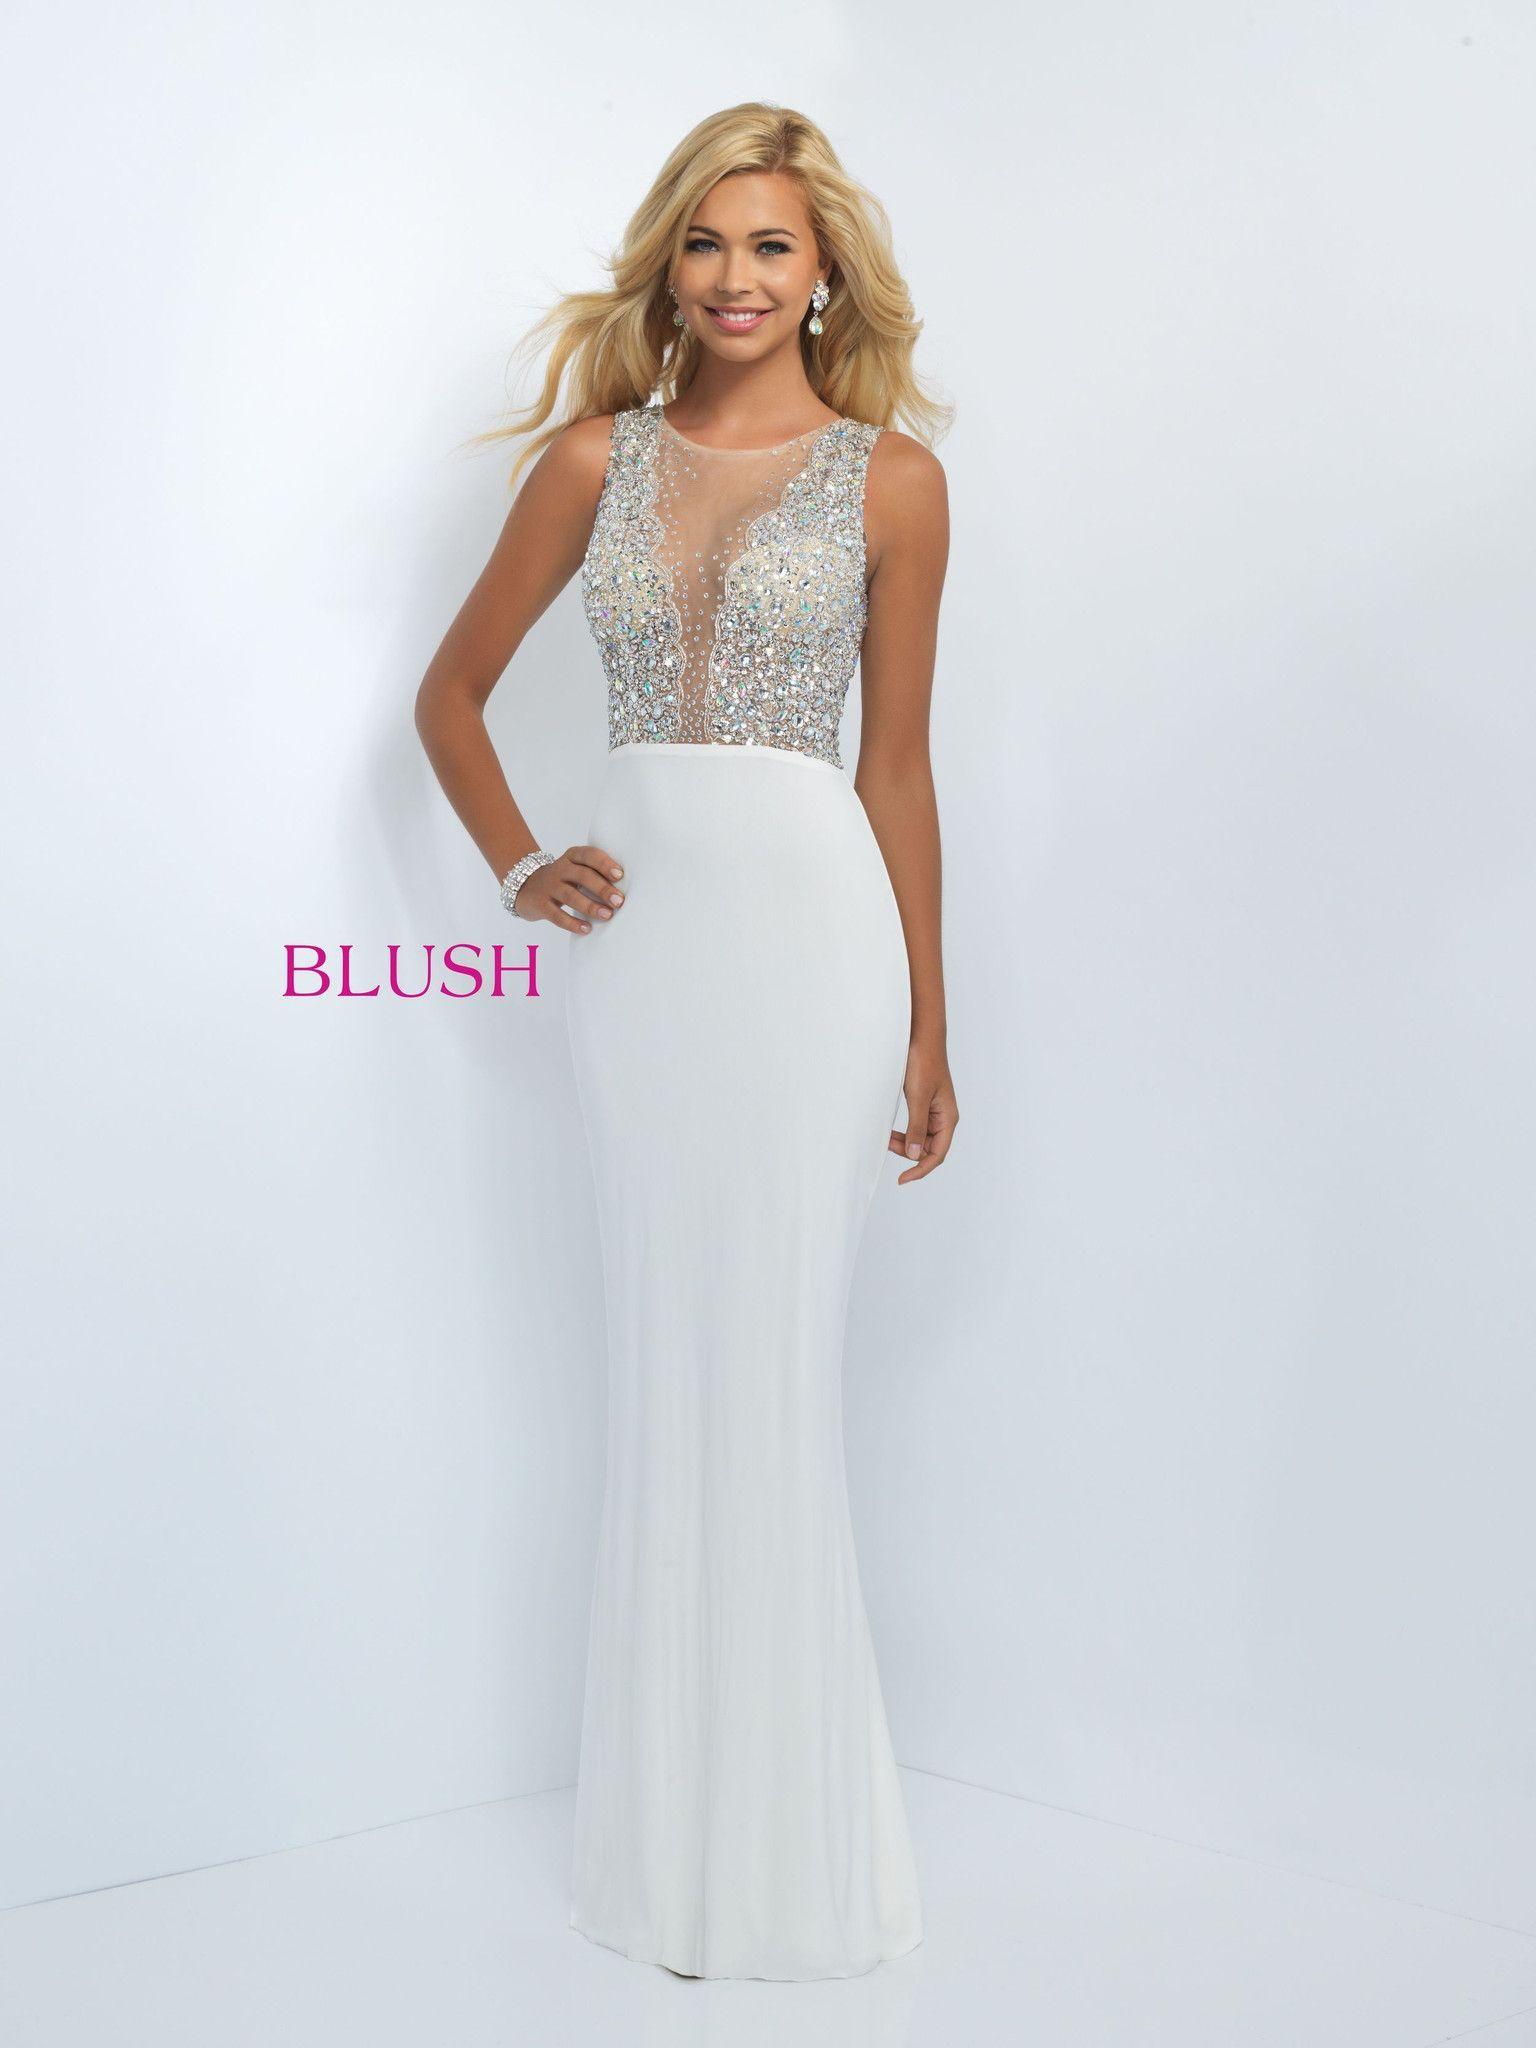 Blush prom off white products pinterest blush prom prom